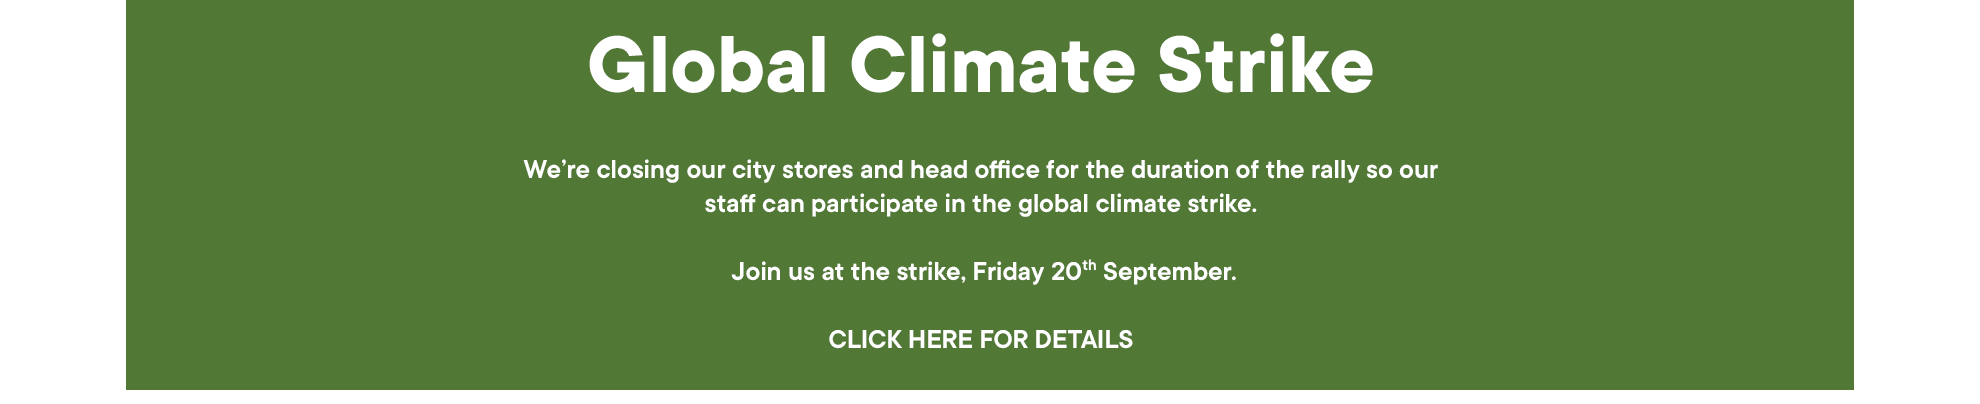 https://www.gormanshop.com.au/climate-strike-store-info